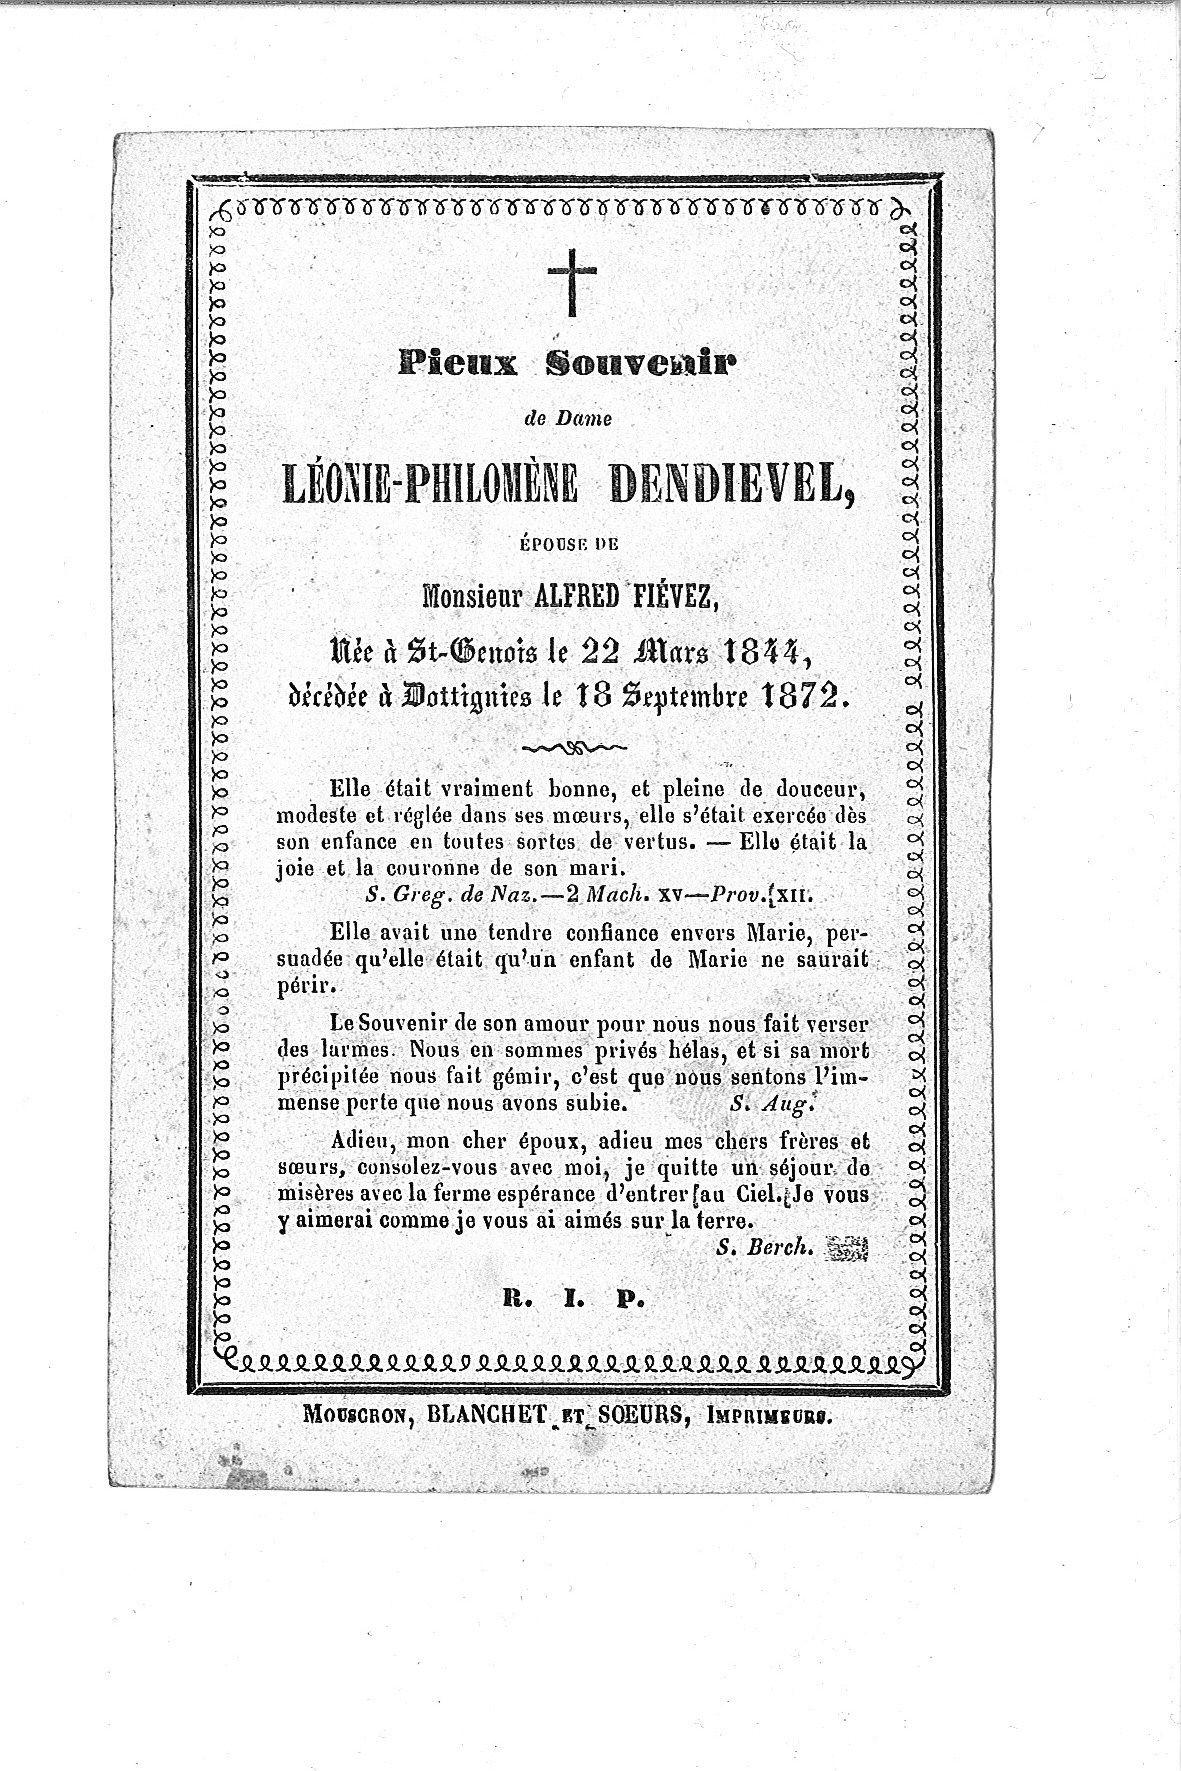 Léonie-Philomène(1872)20091001174046_00027.jpg